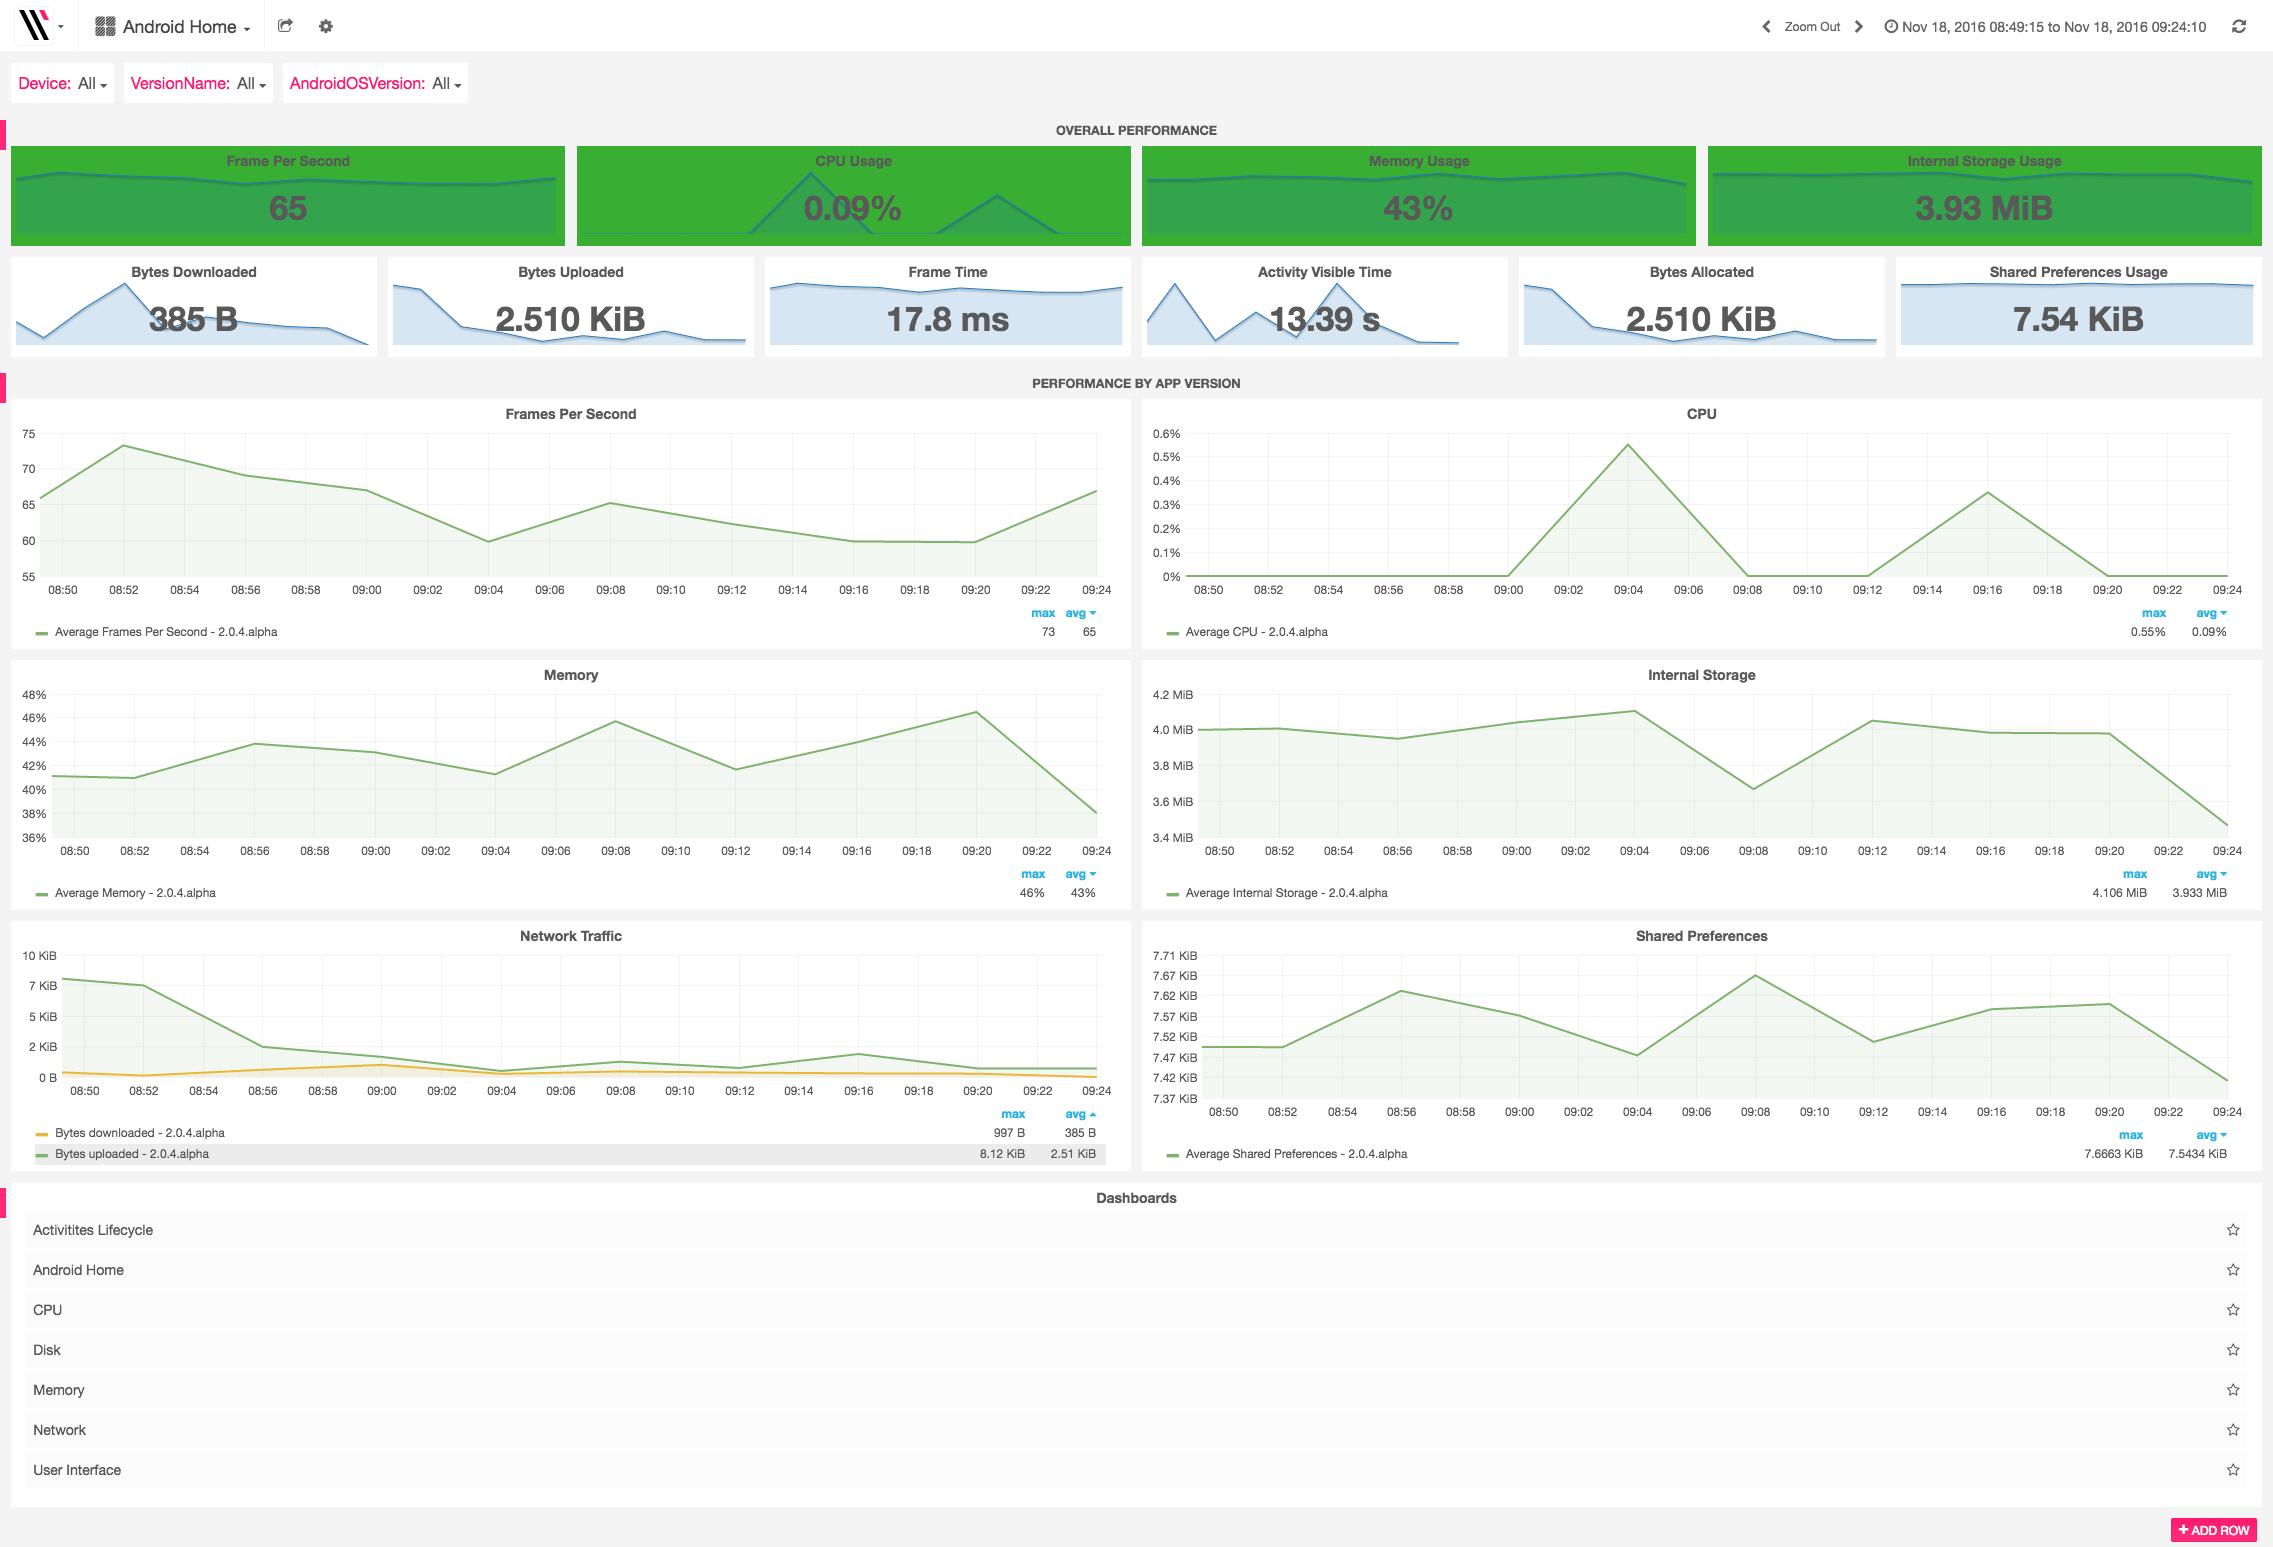 DevelopmentScreenshot